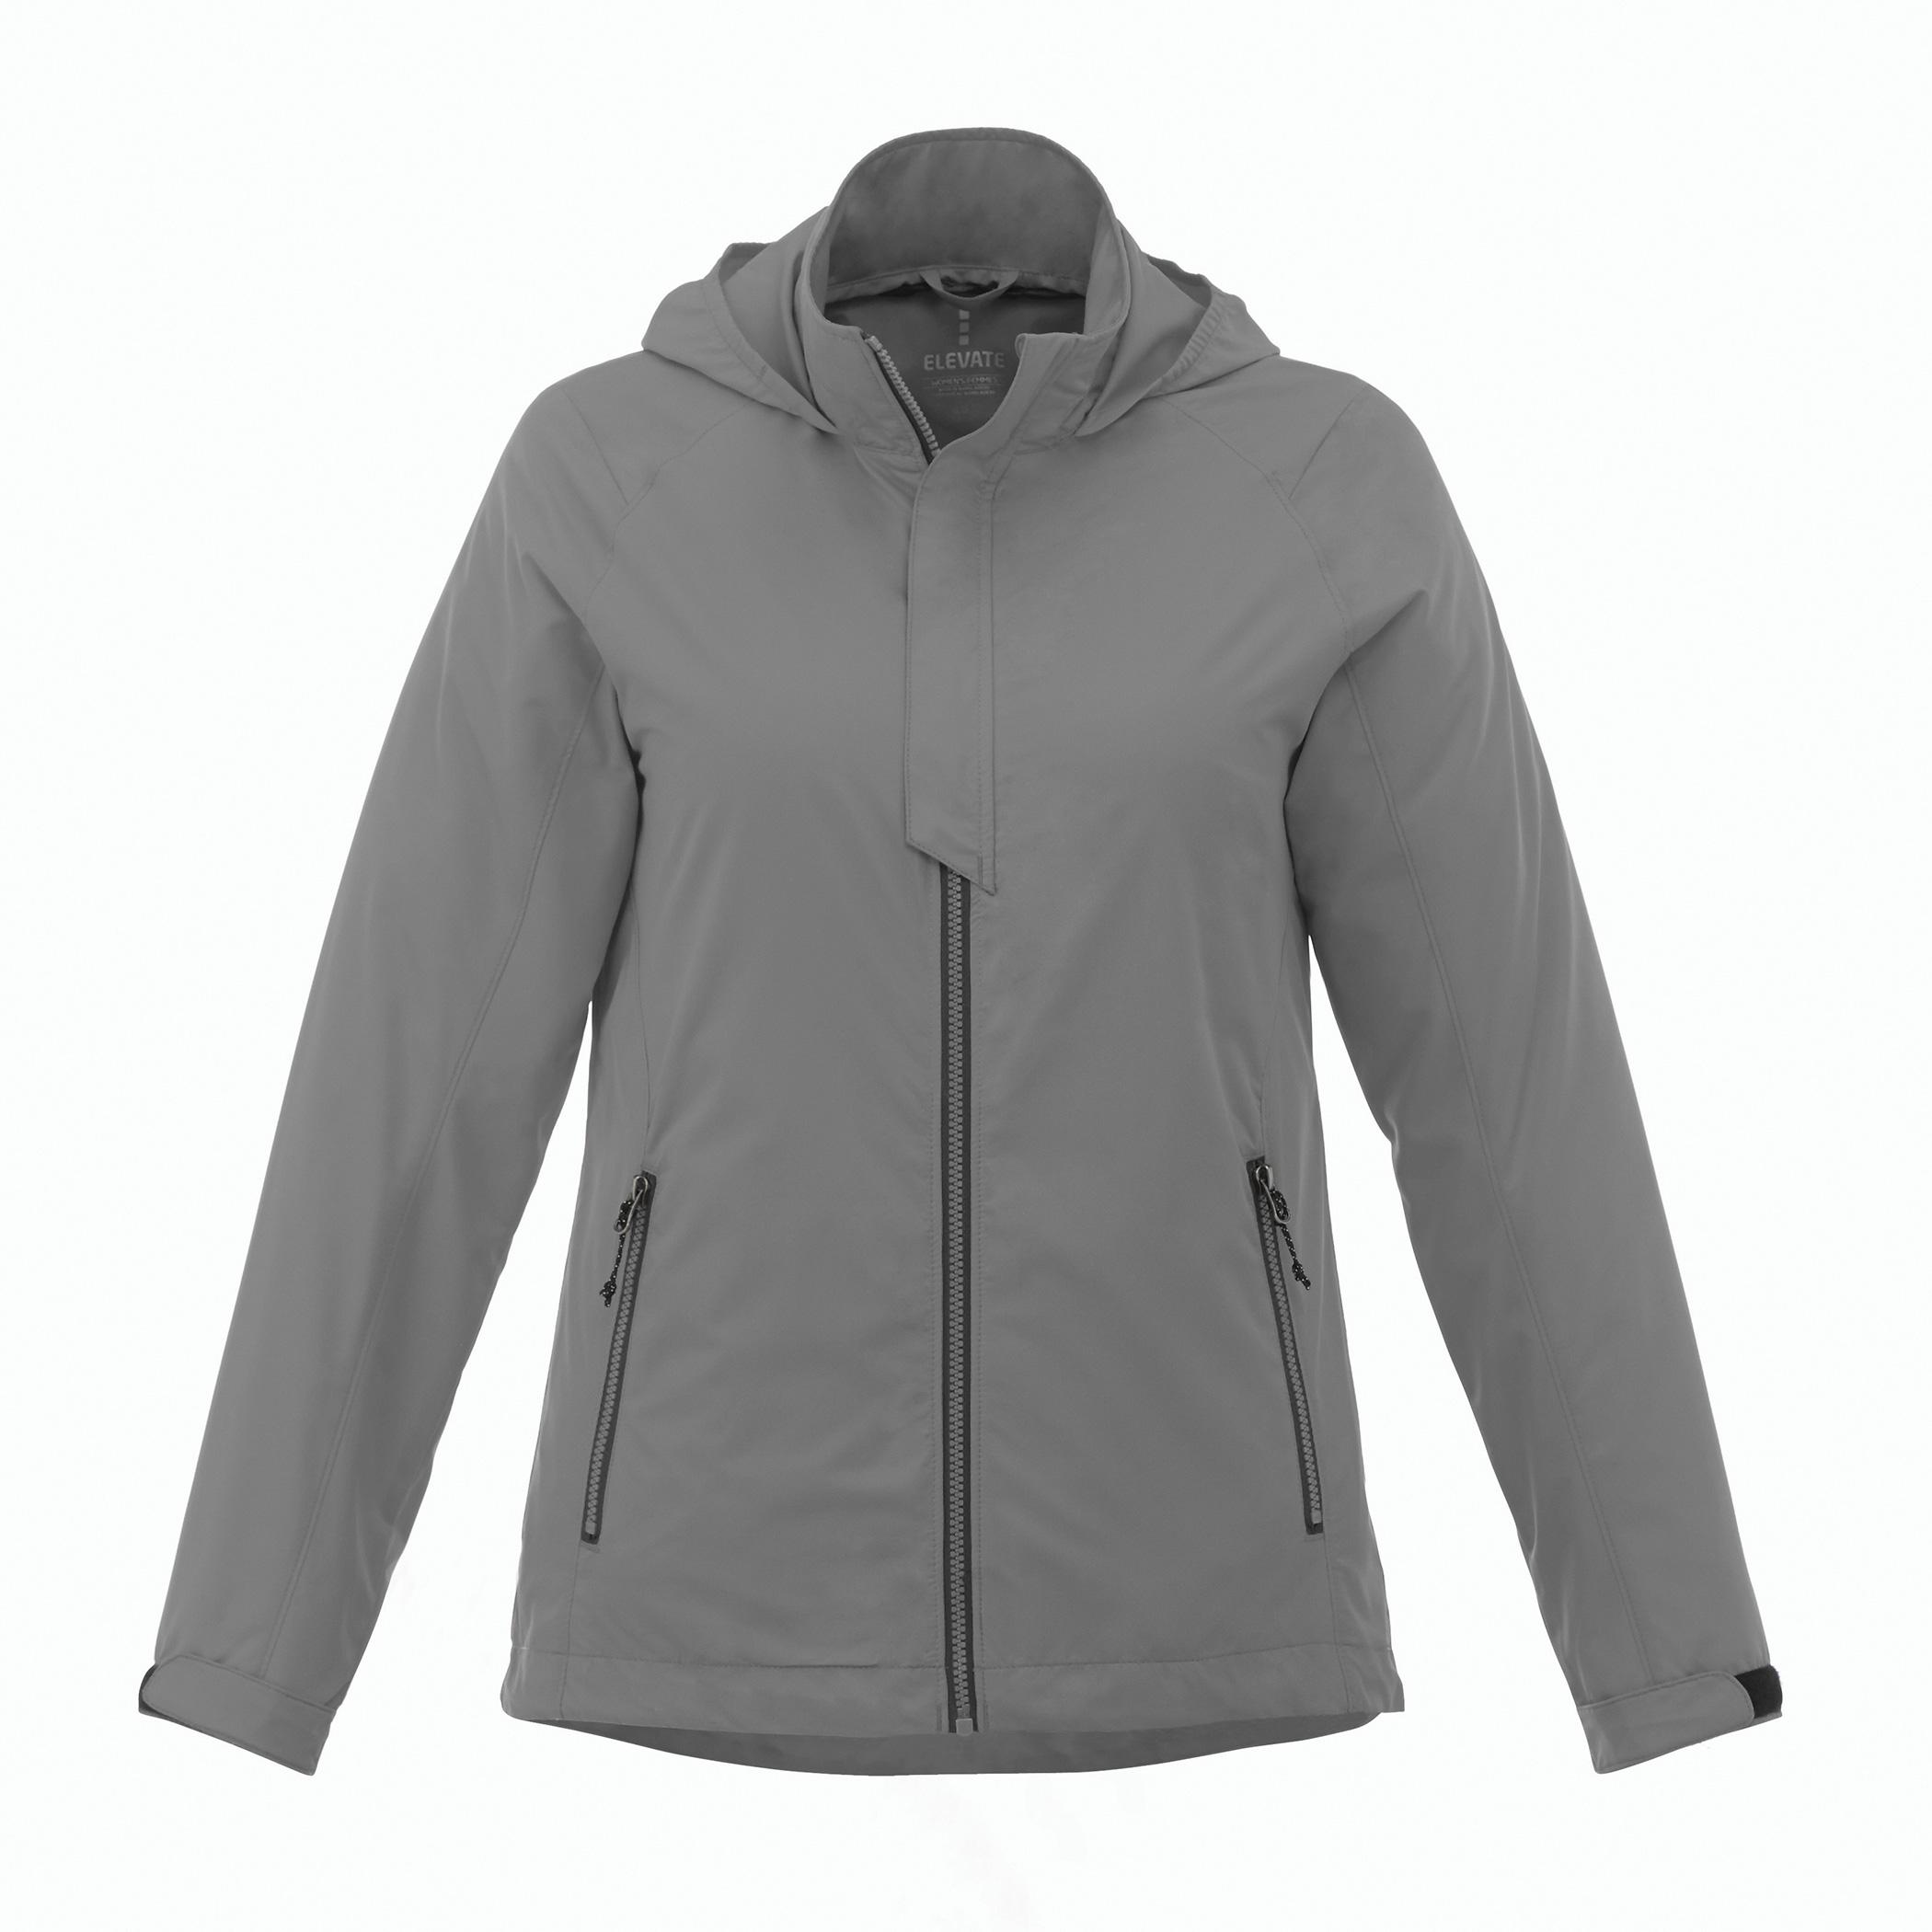 WKarula Sportswear Lightweight Group Jacket Trimark dCxerBo